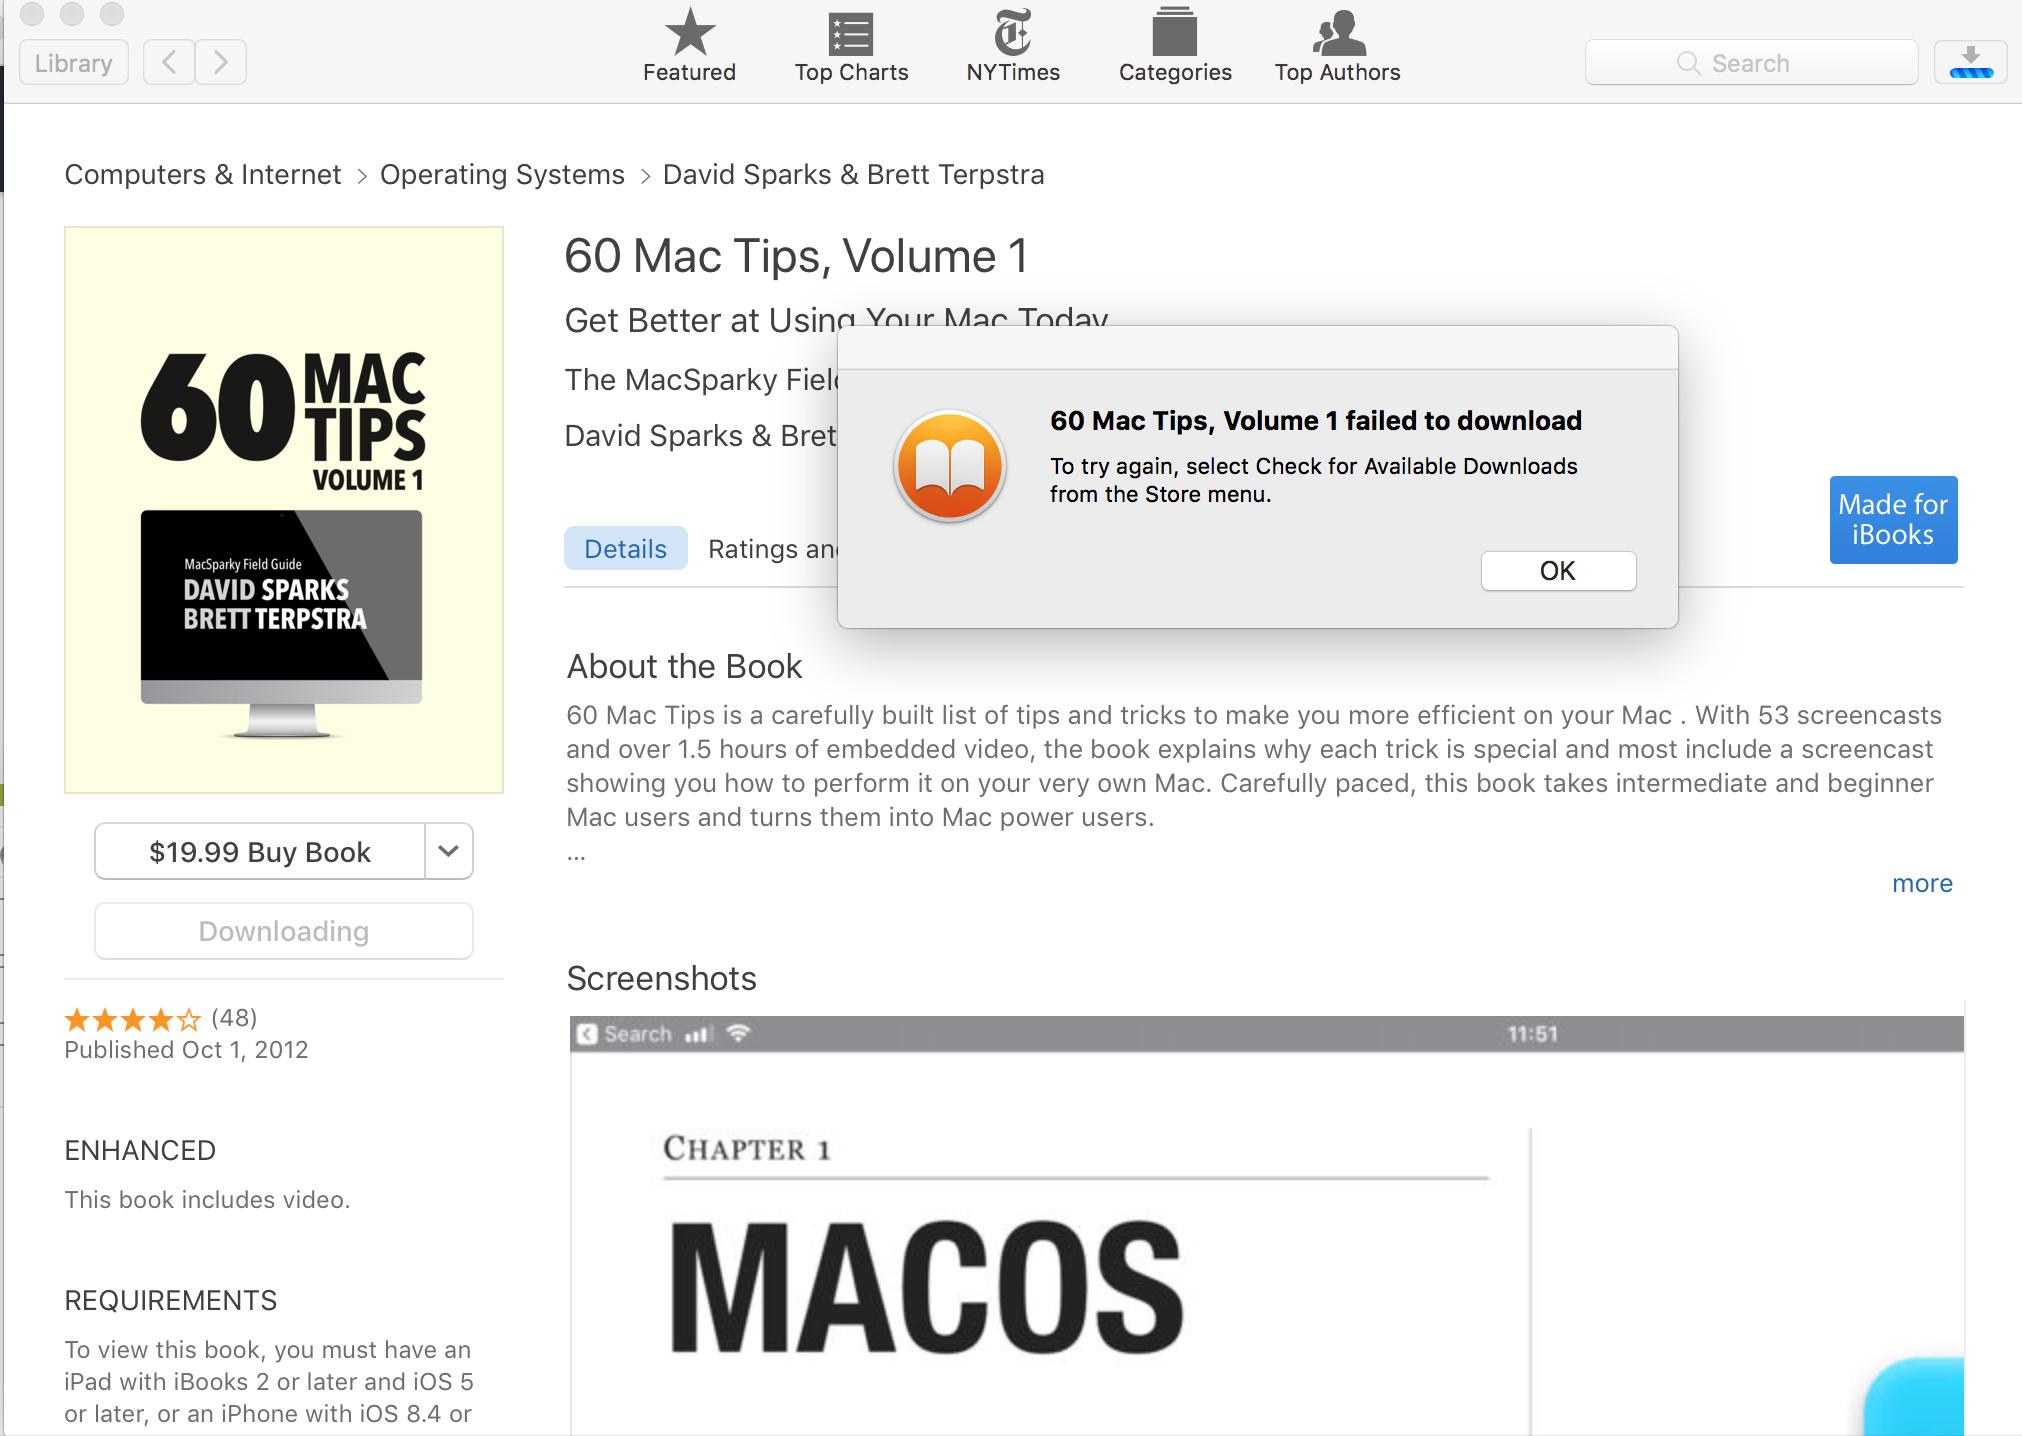 iBooks Store broken? - Tech Support - MPU Talk